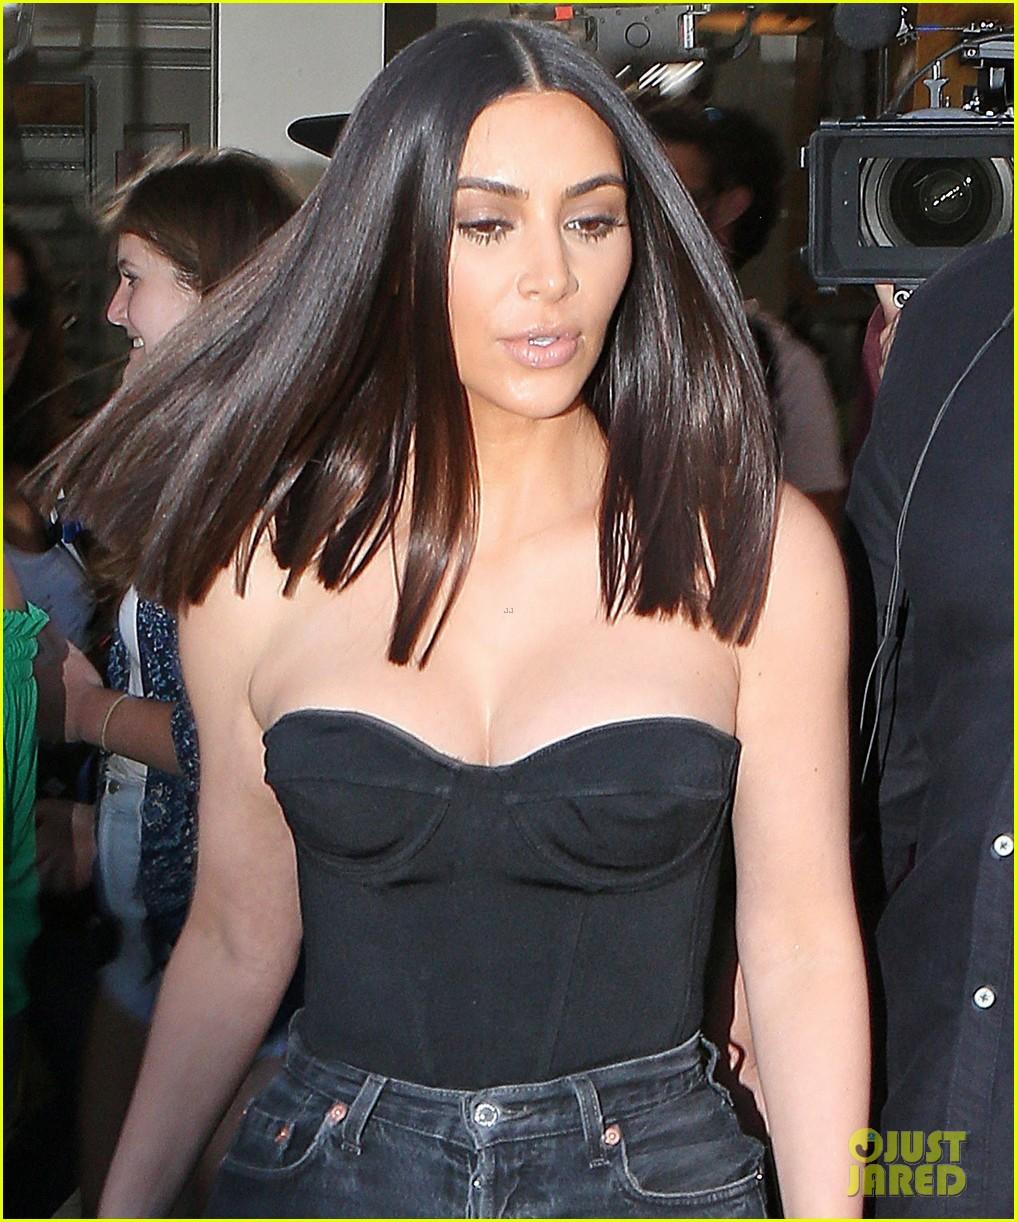 Kim Kardashian Is Getting Her Uterus Repaired Photo 3880448 Kendall Jenner Kim Kardashian Pictures Just Jared